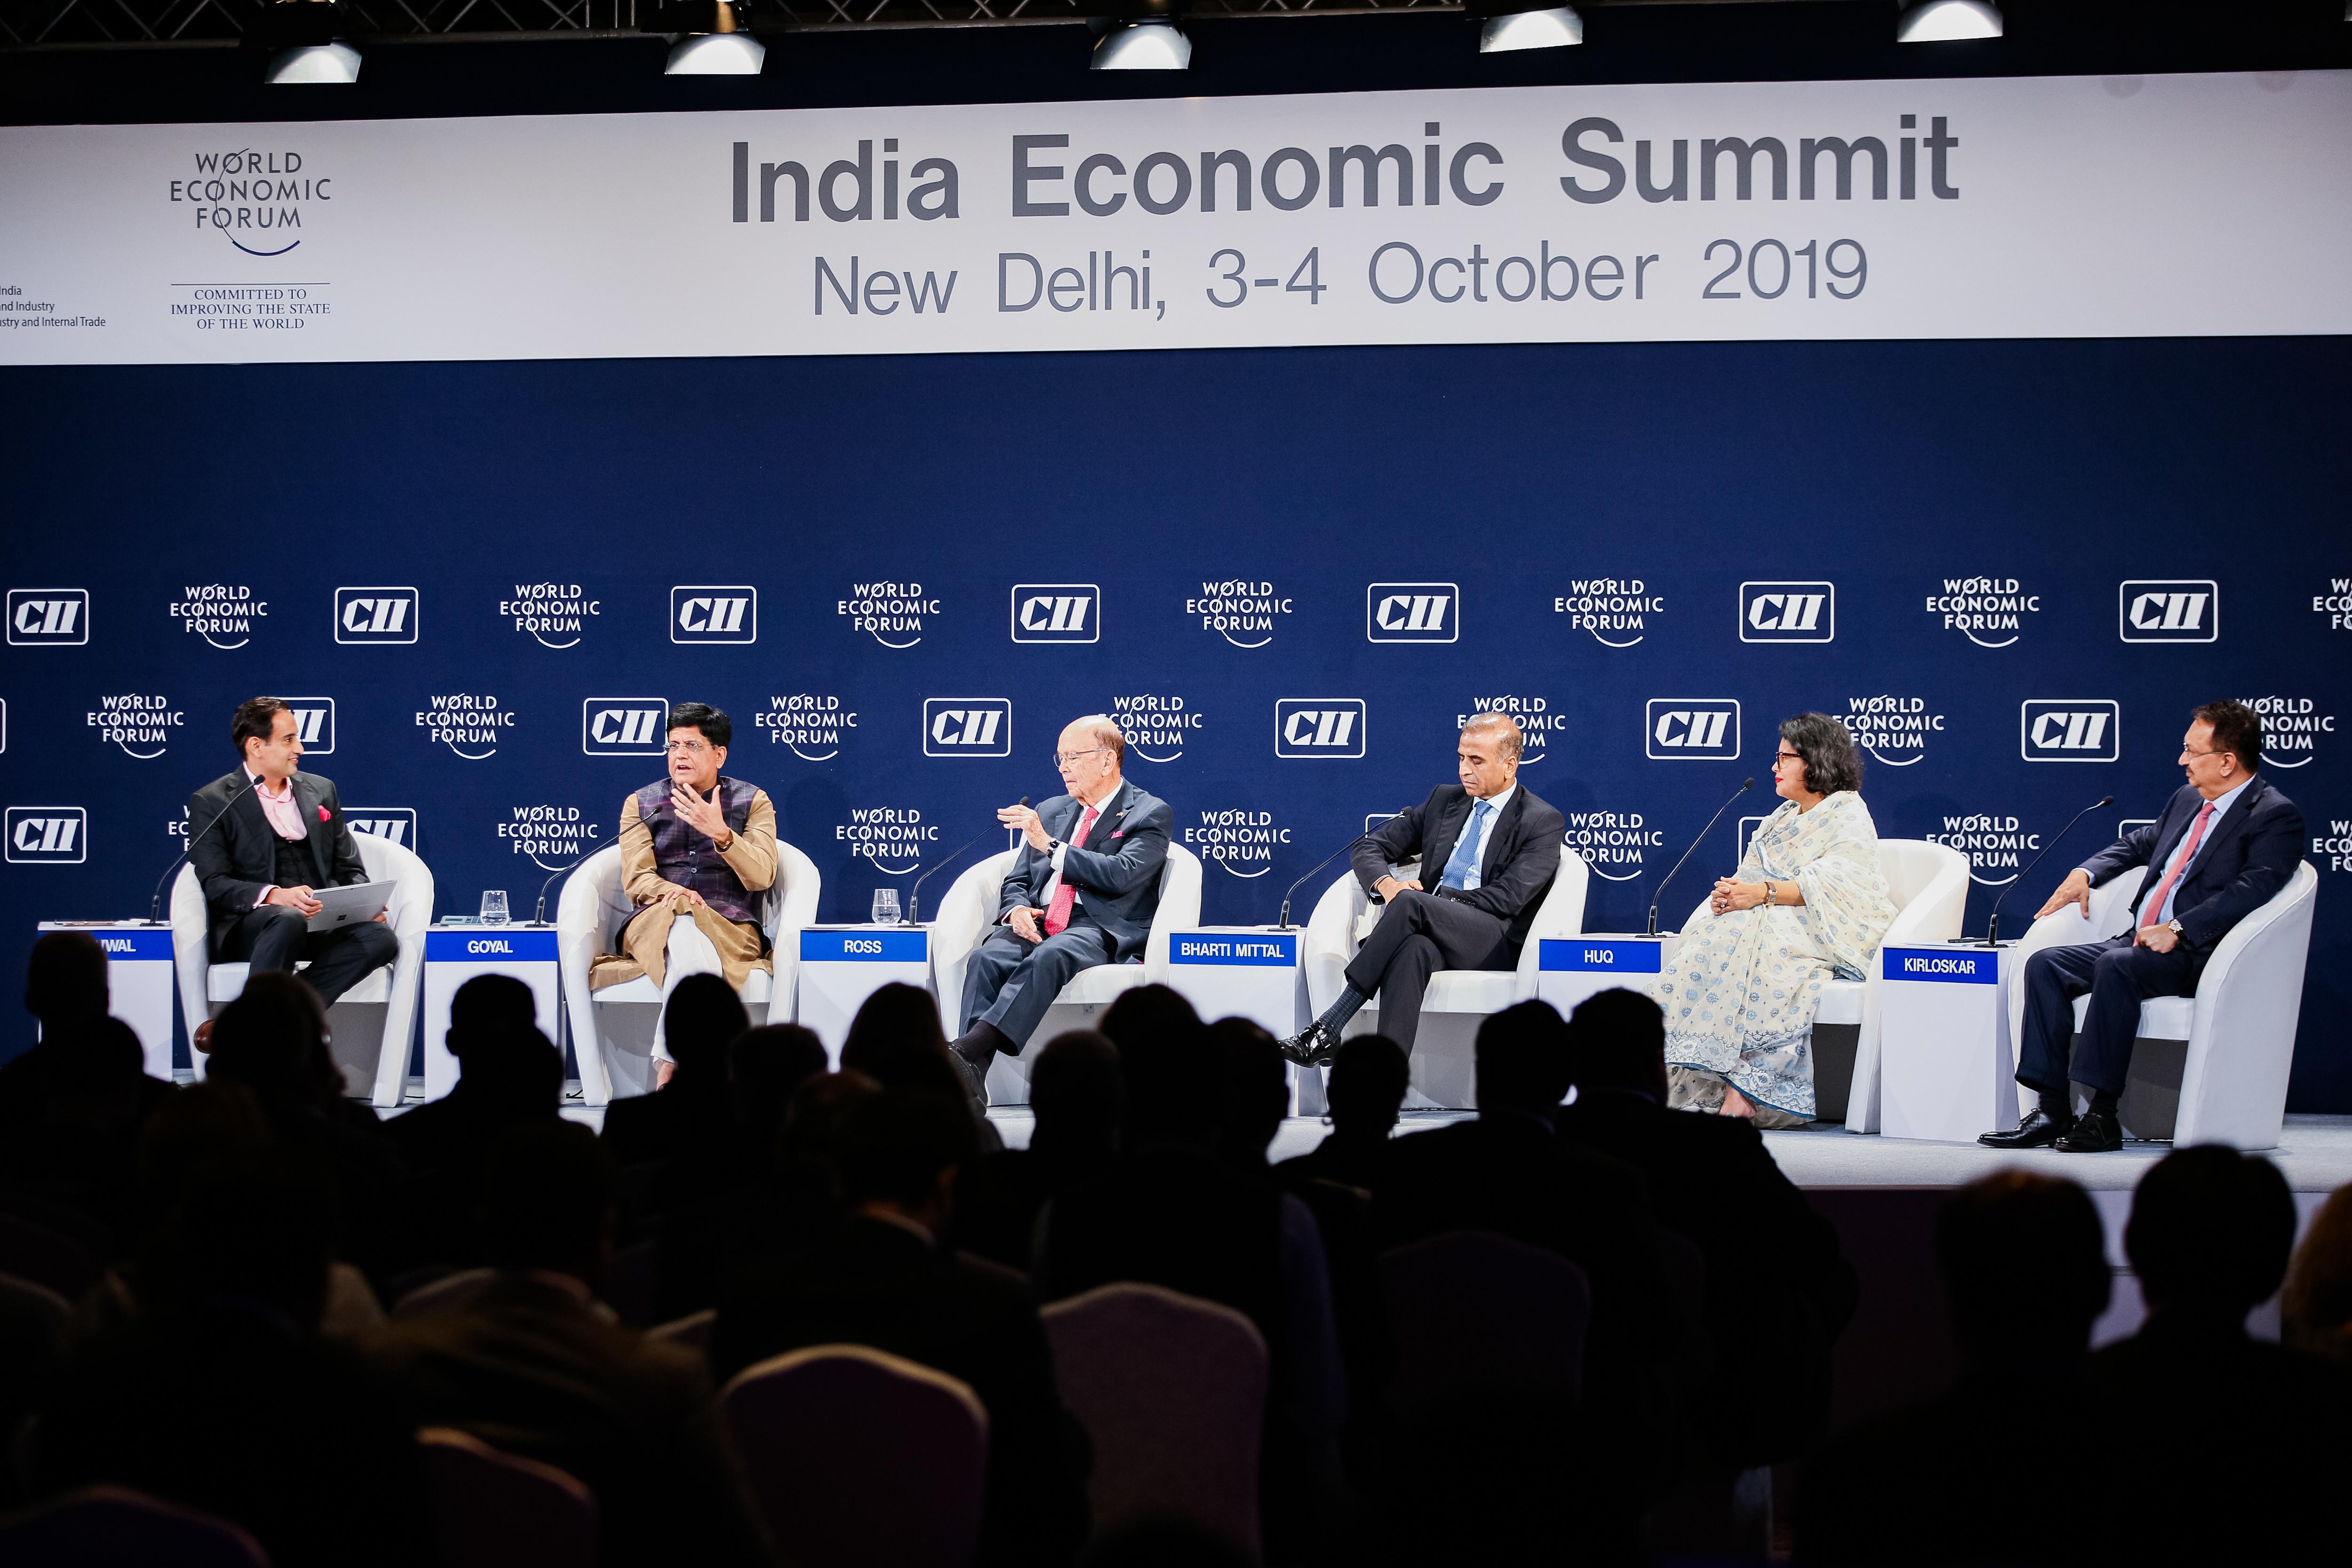 India Economic Summit | World Economic Forum